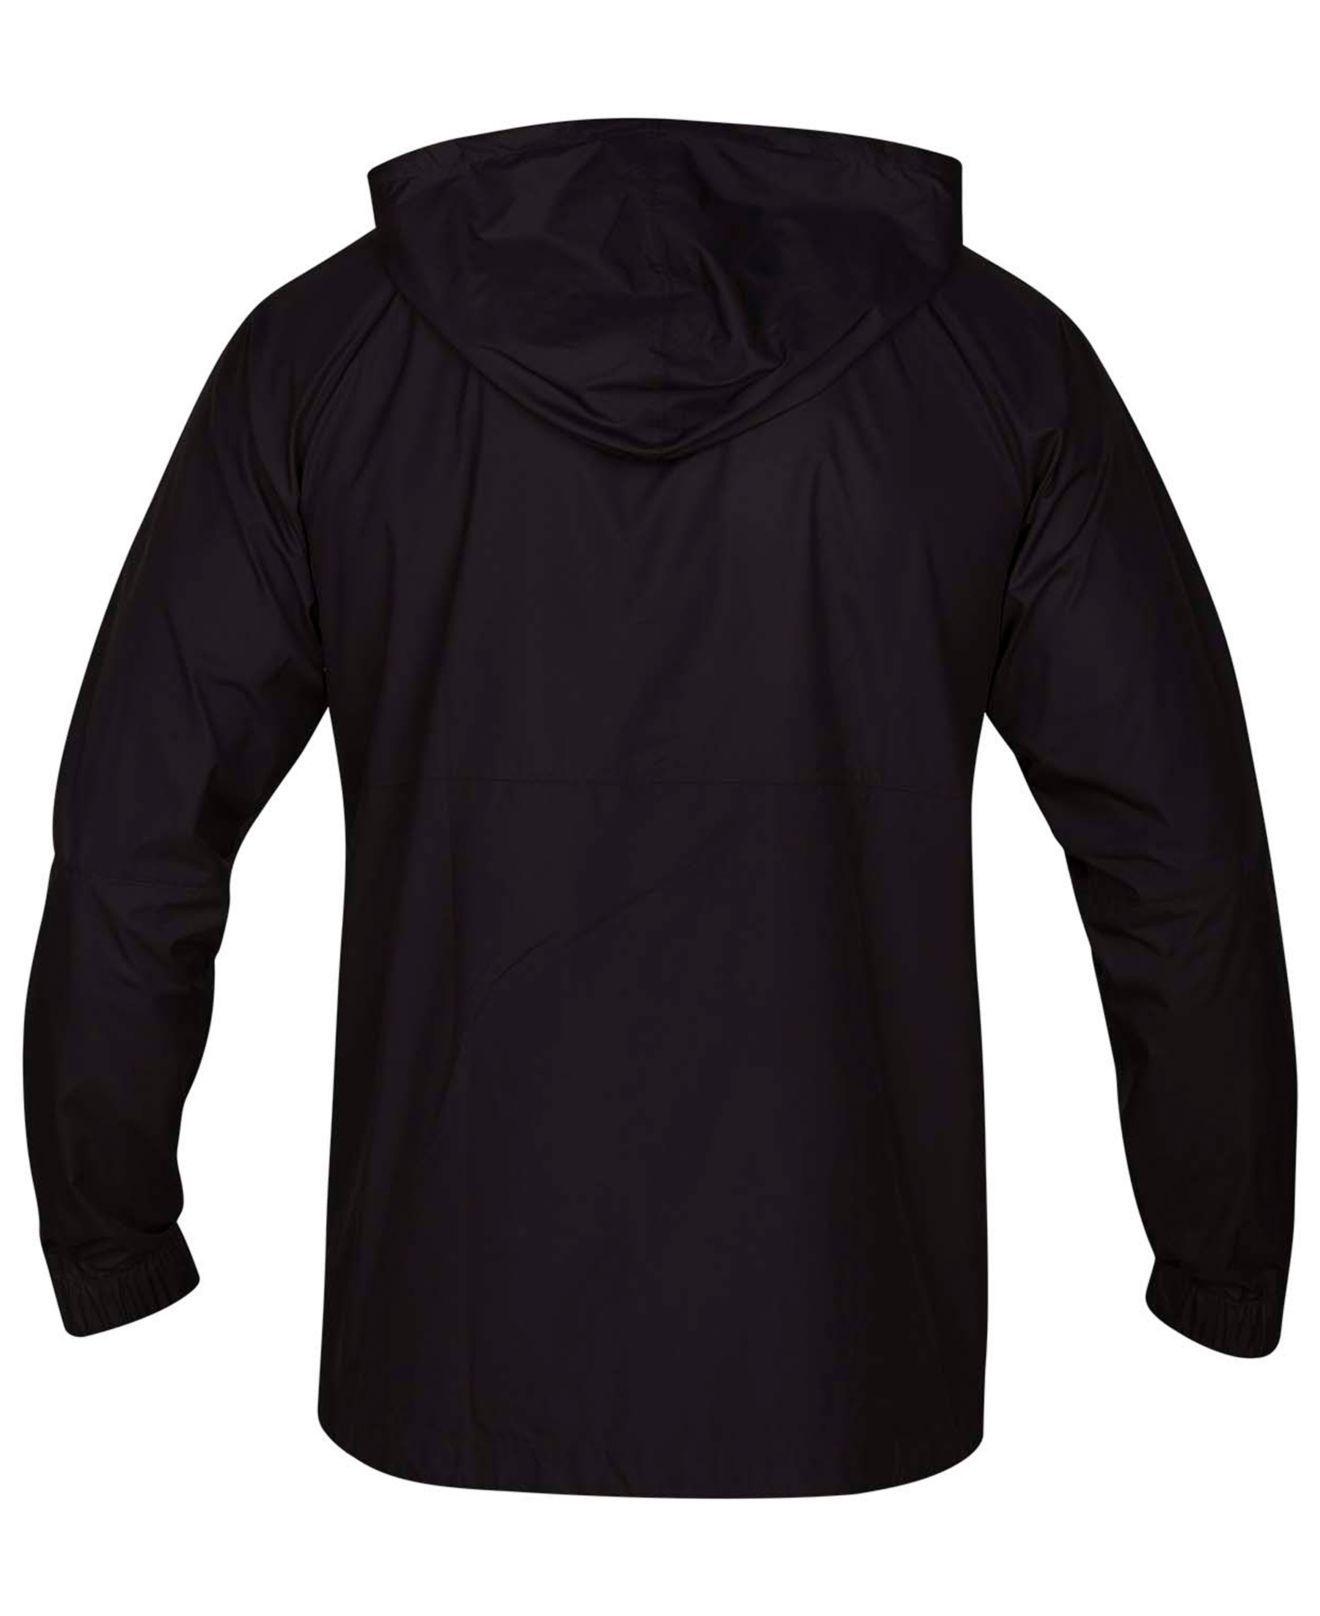 a0b00fff755 Lyst - Hurley Pistol River Full-zip Hooded Jacket in Black for Men